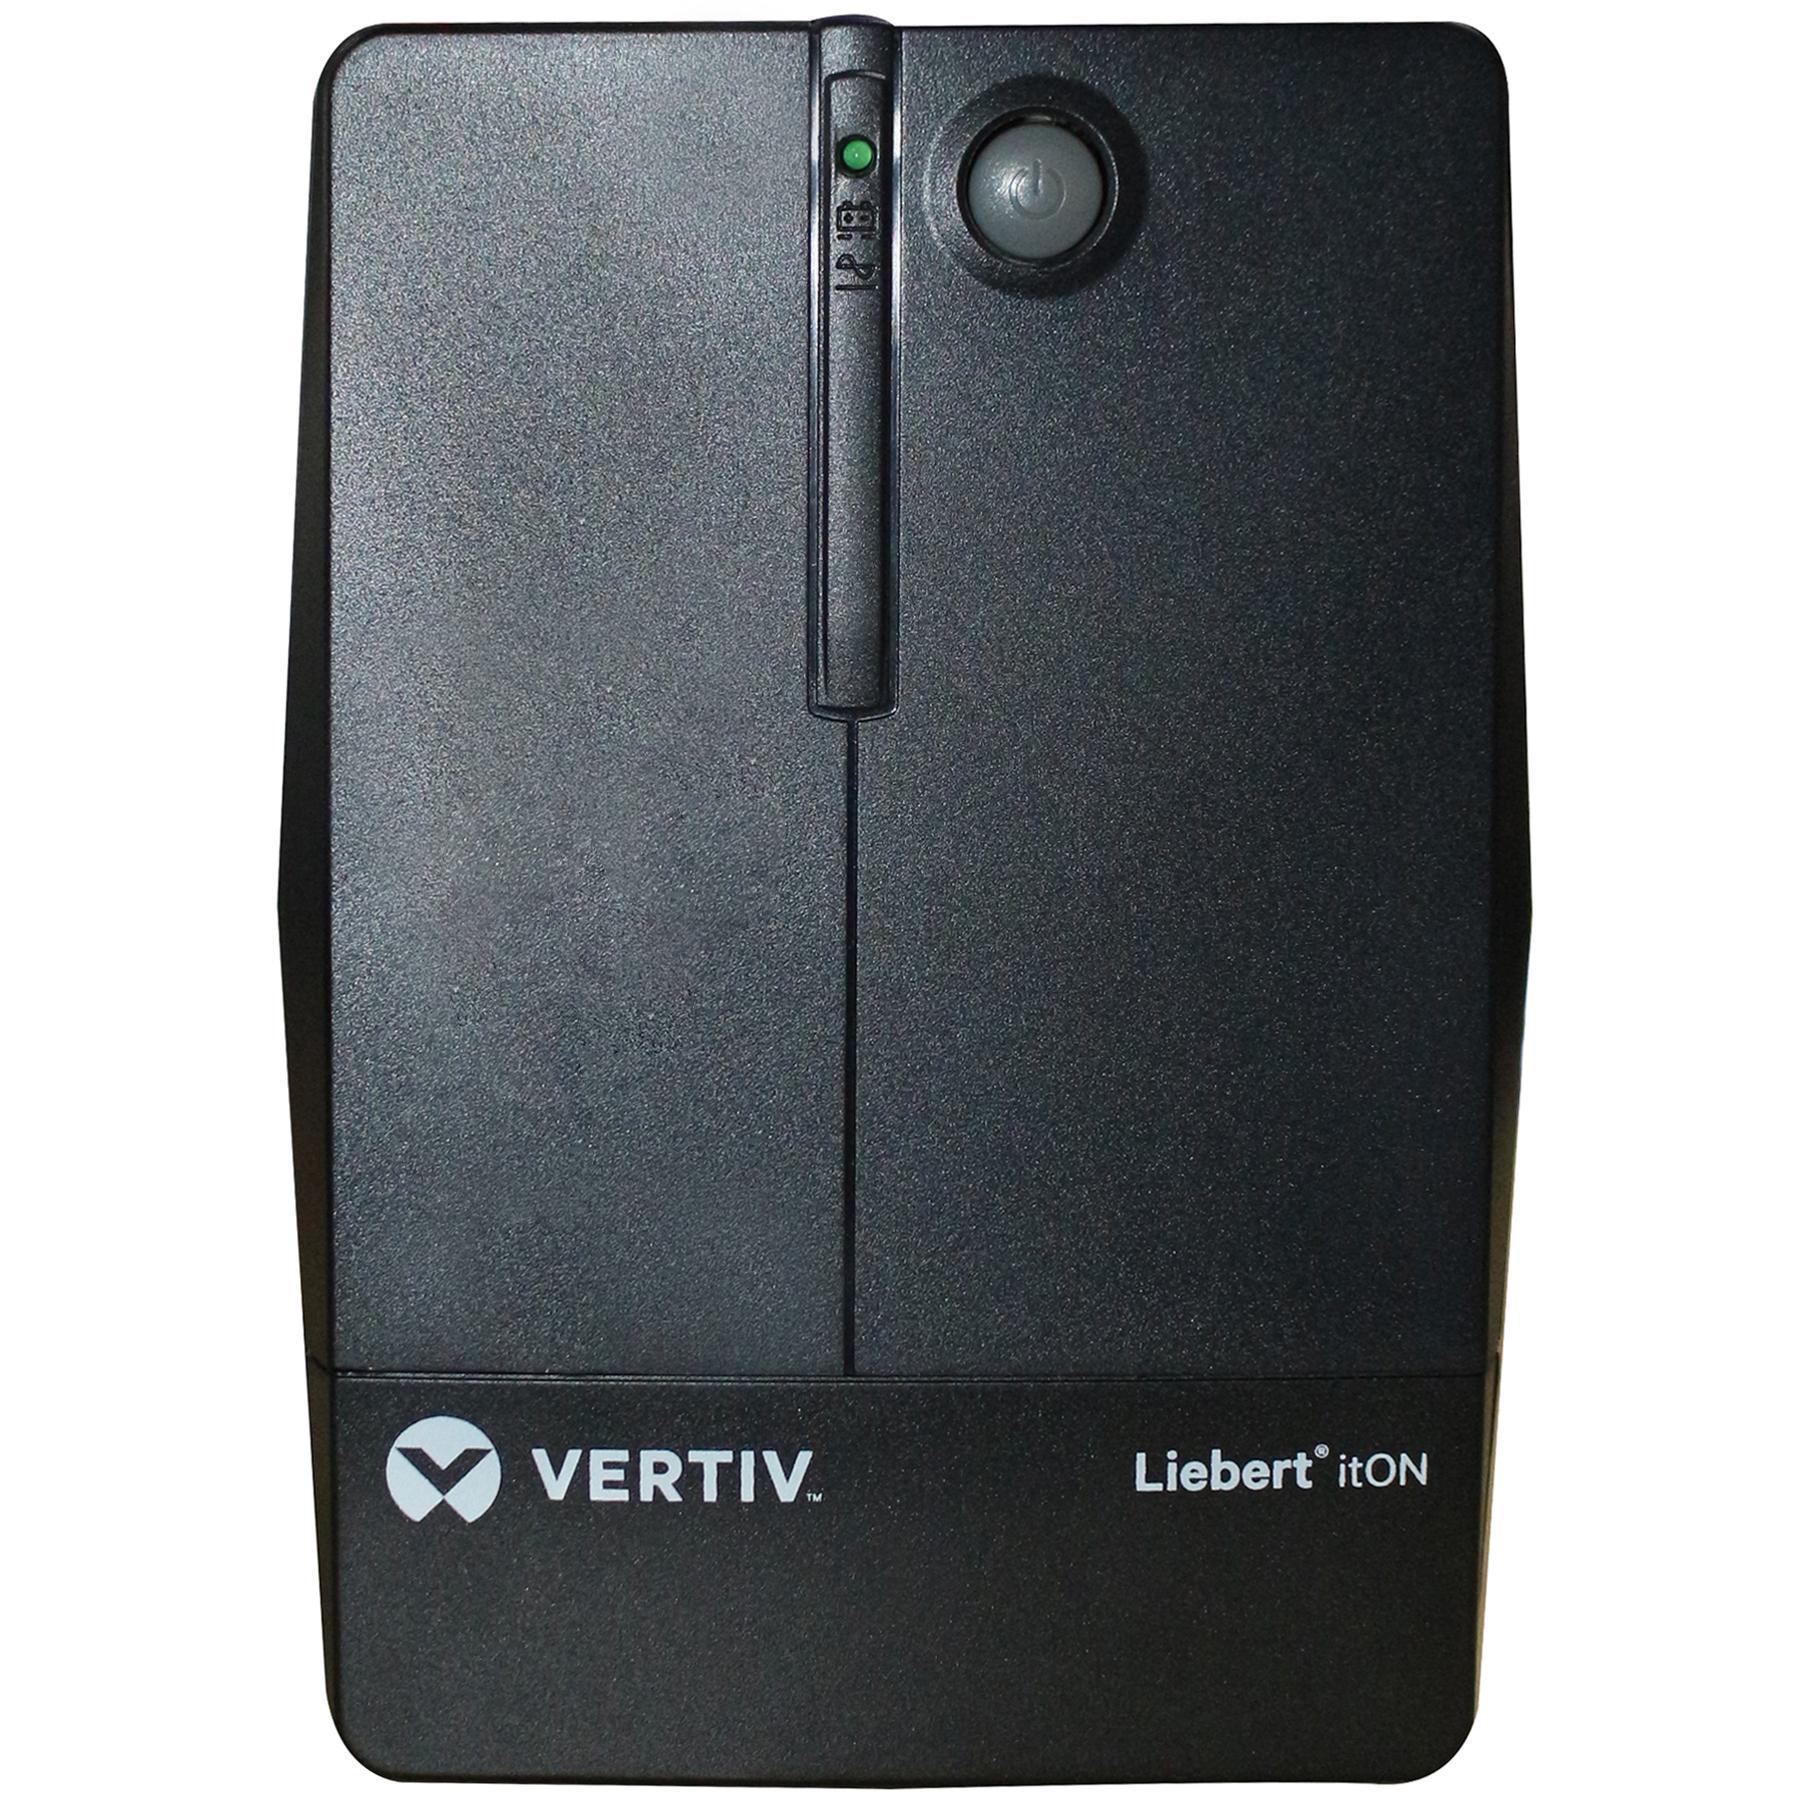 L/I   2000VA - VERTIV